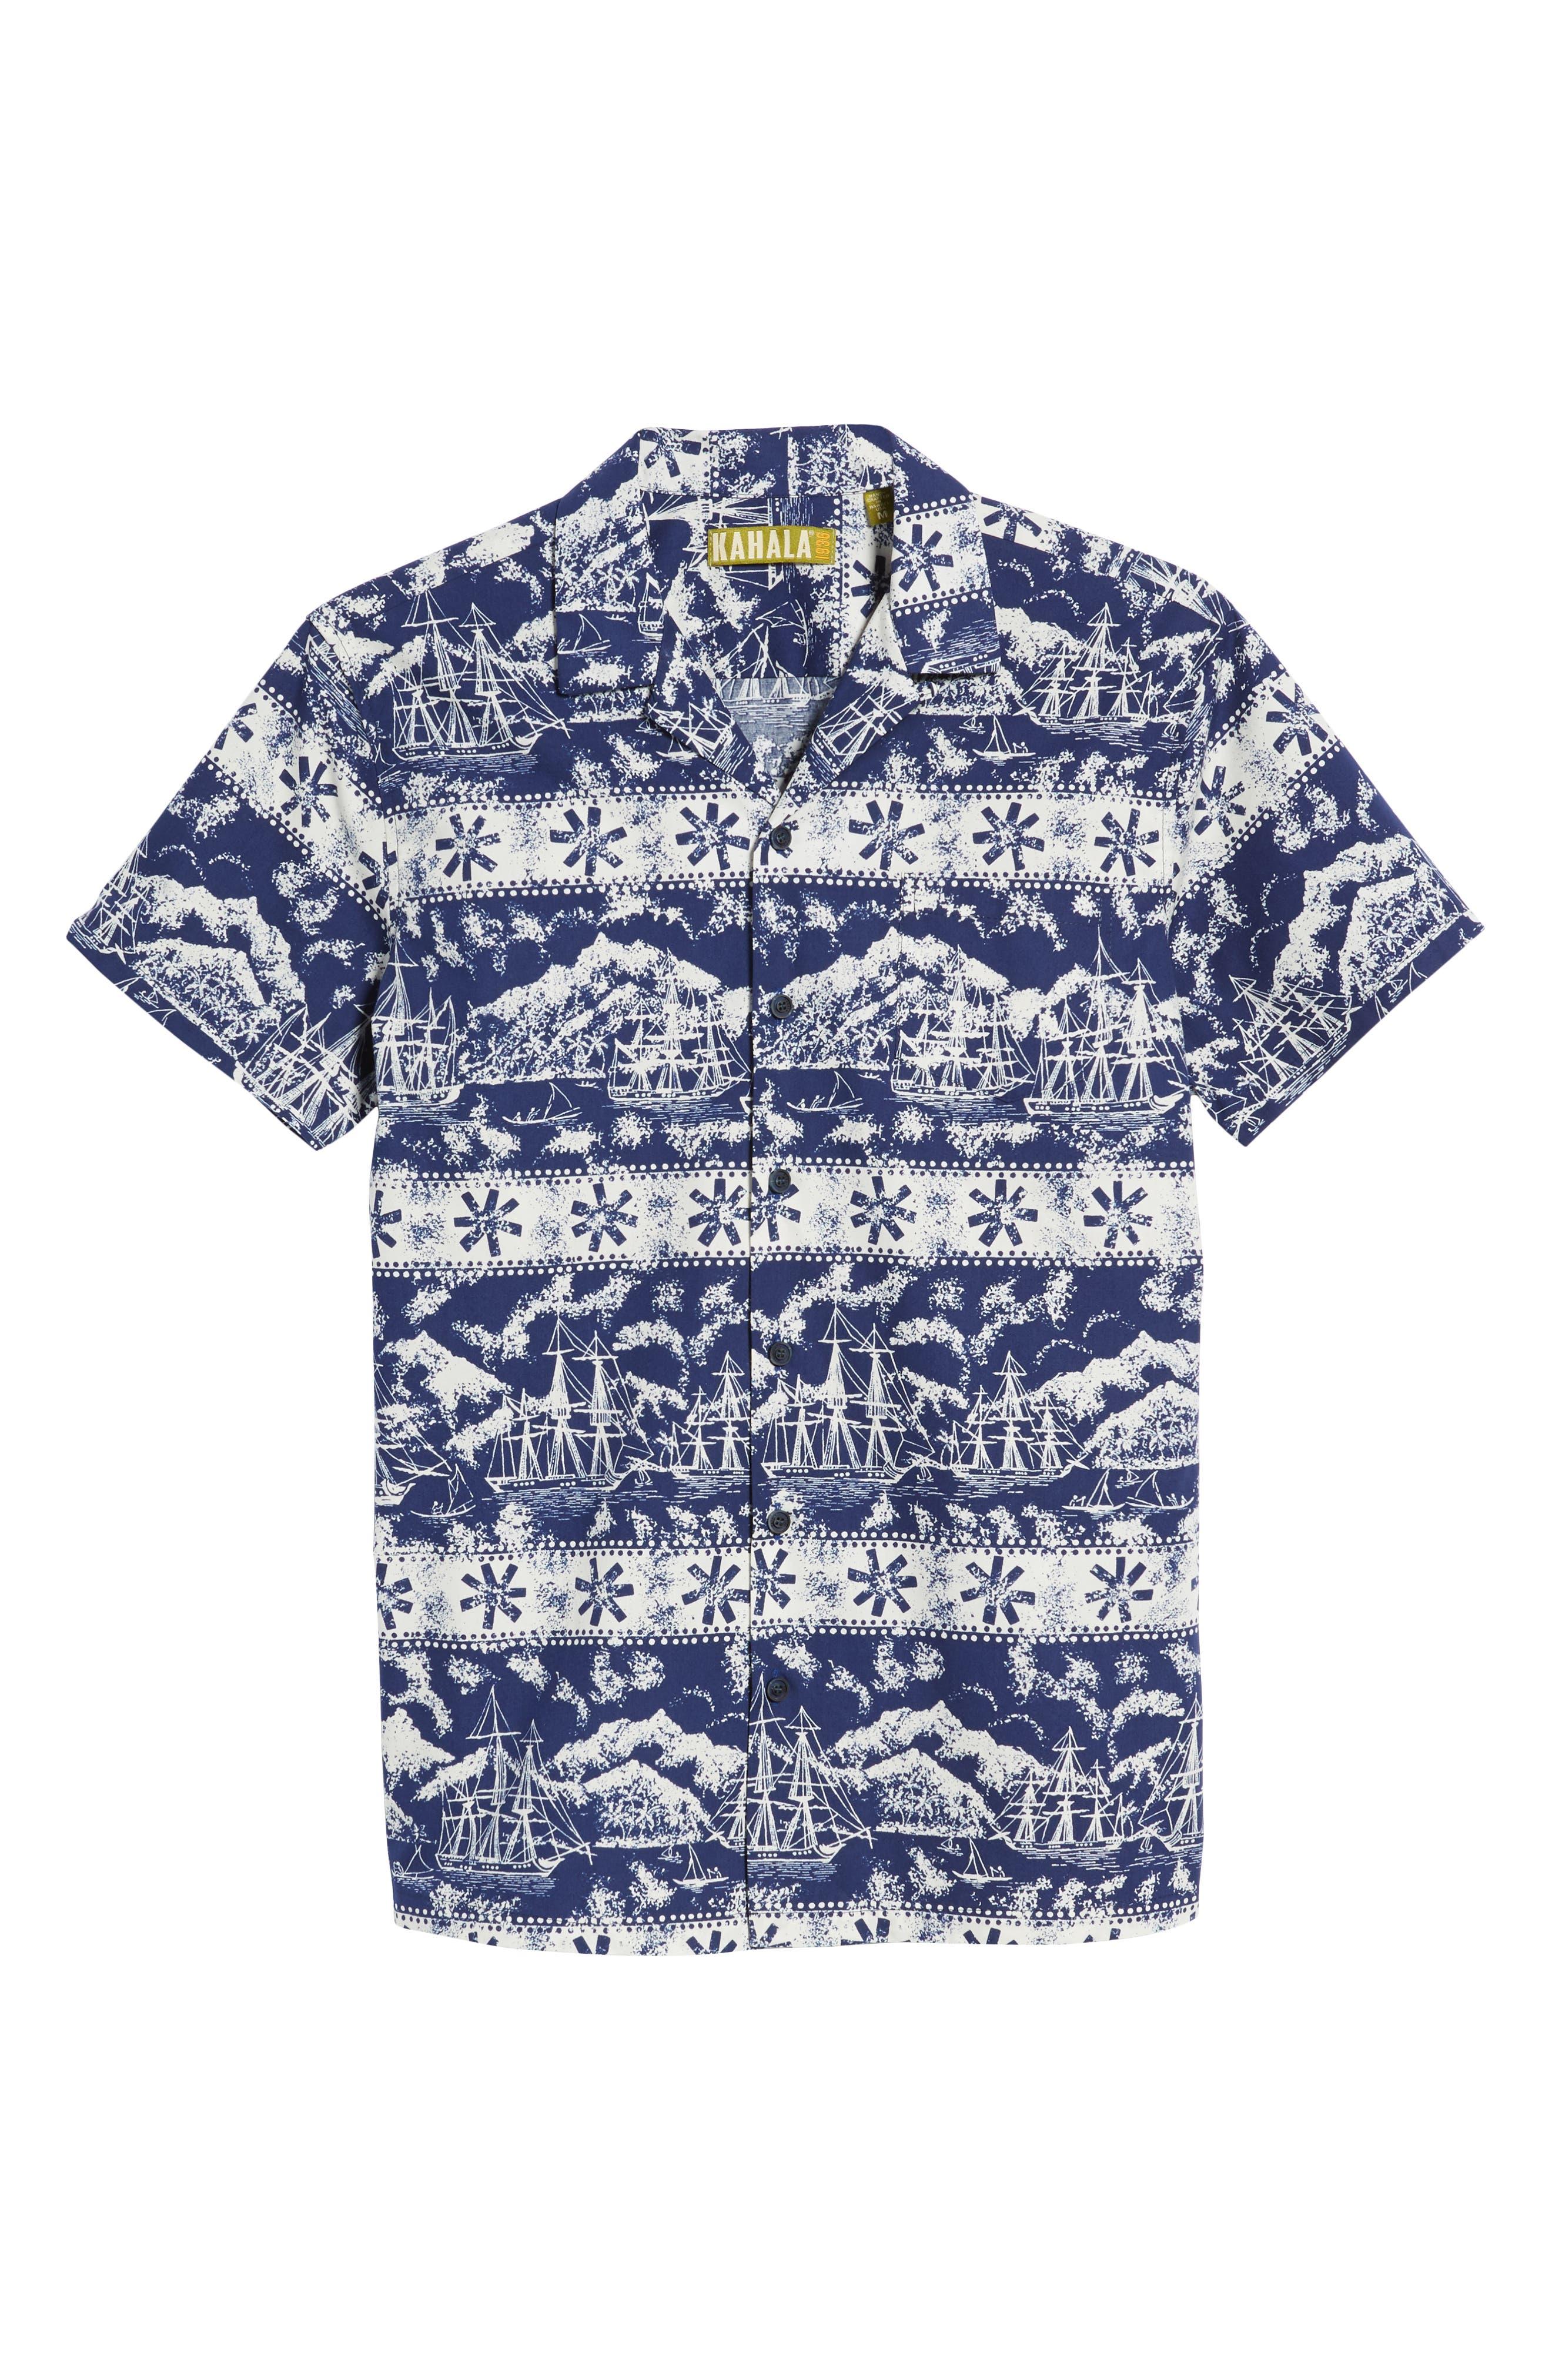 Safe Harbor Slim Fit Camp Shirt,                             Alternate thumbnail 6, color,                             415